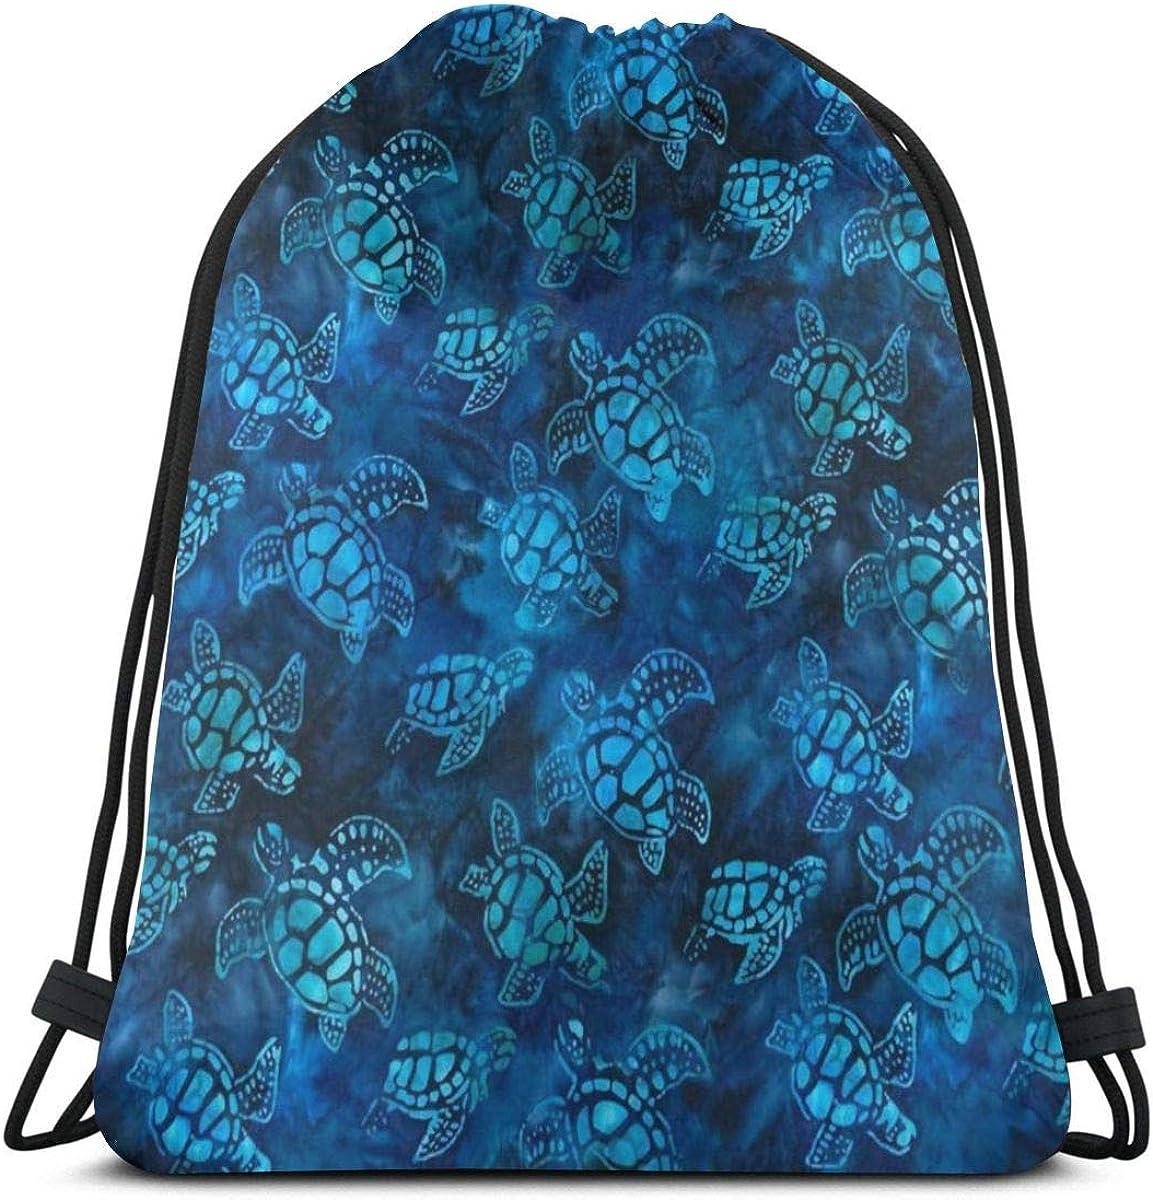 MSGUIDE Drawstring Backpack Atlanta Mall Sports 5 ☆ popular Gym Men Women Bag for